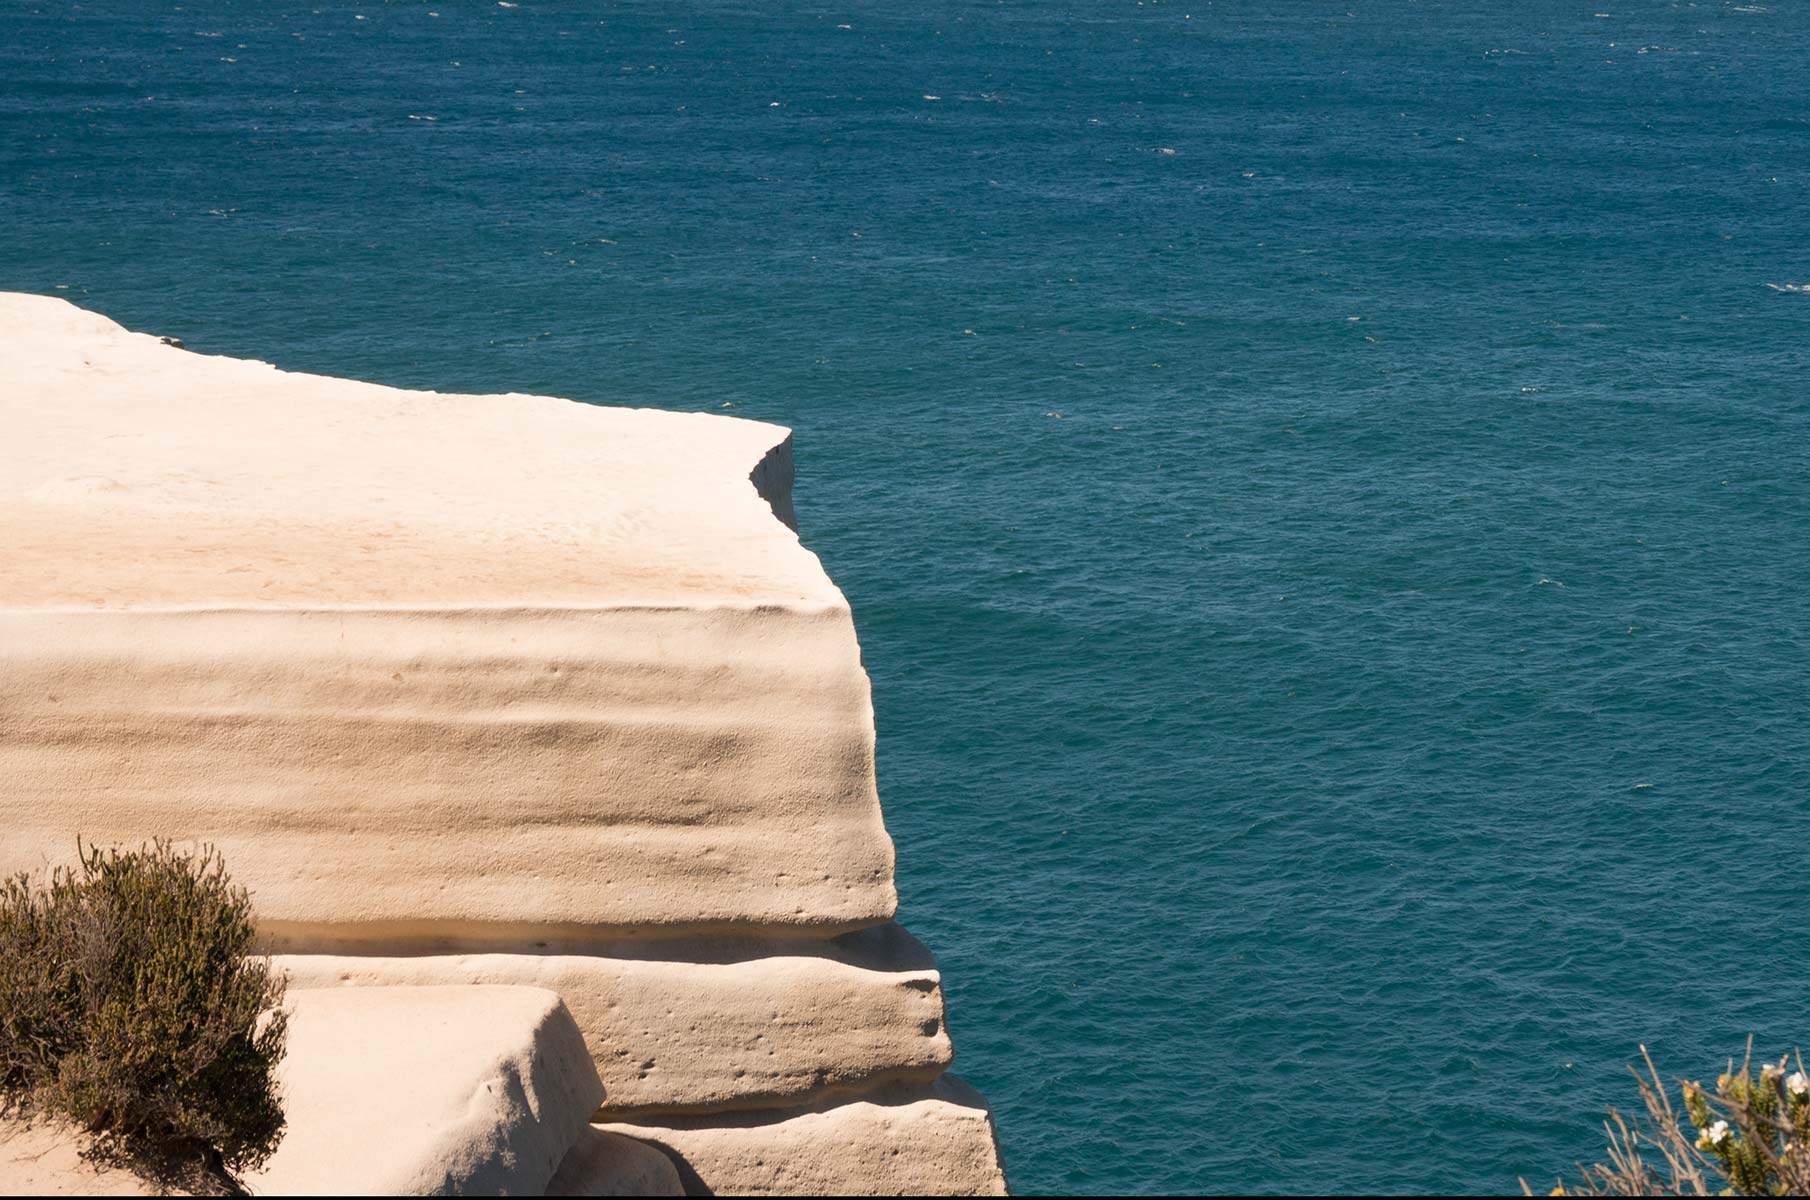 Wedding Cake Rock im Royal National Park, Australien